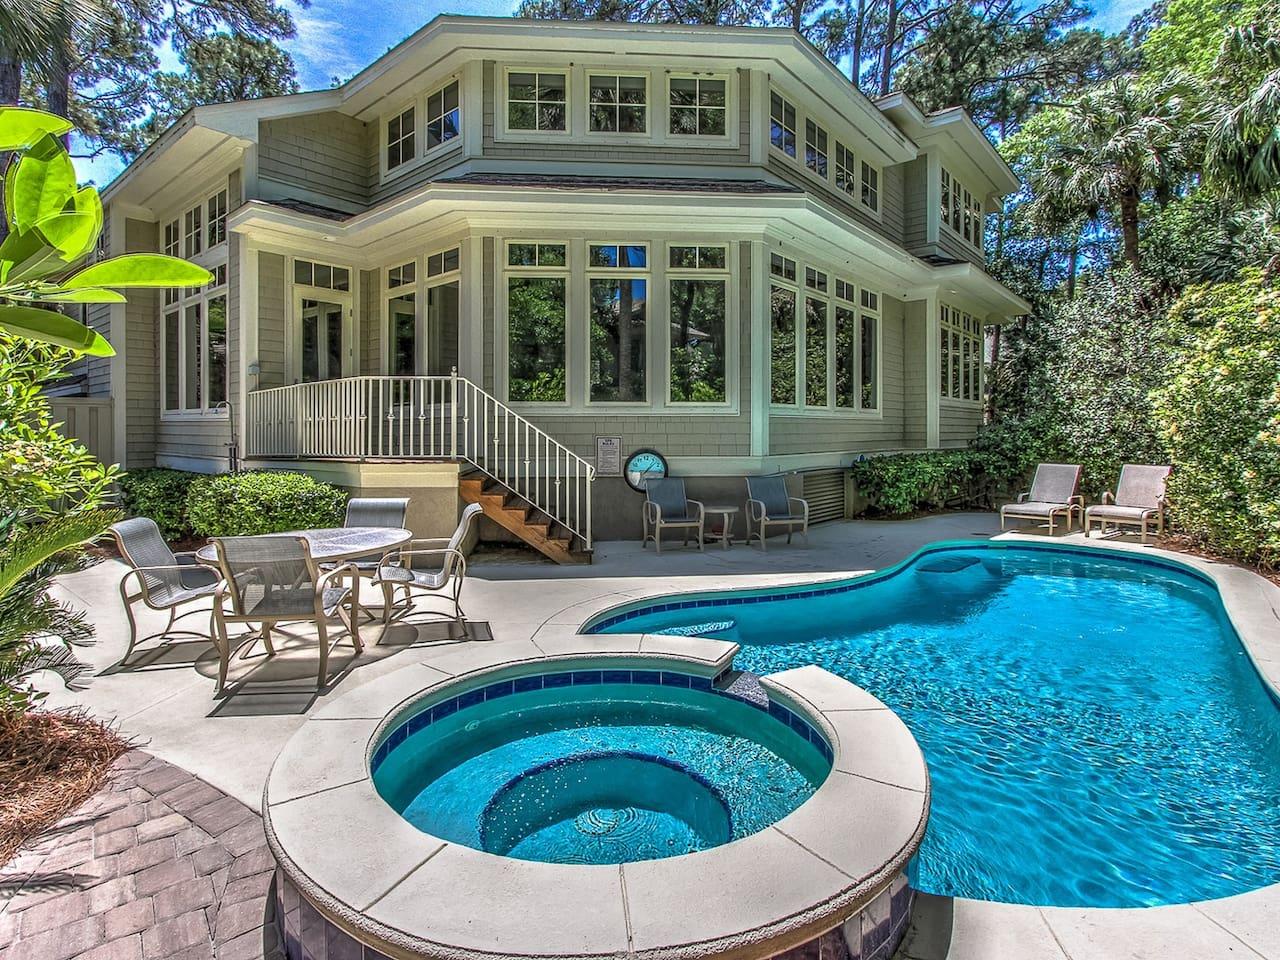 21 Ruddy Turnstone - Beautiful 5 bedroom Vacation Home in Sea Pines